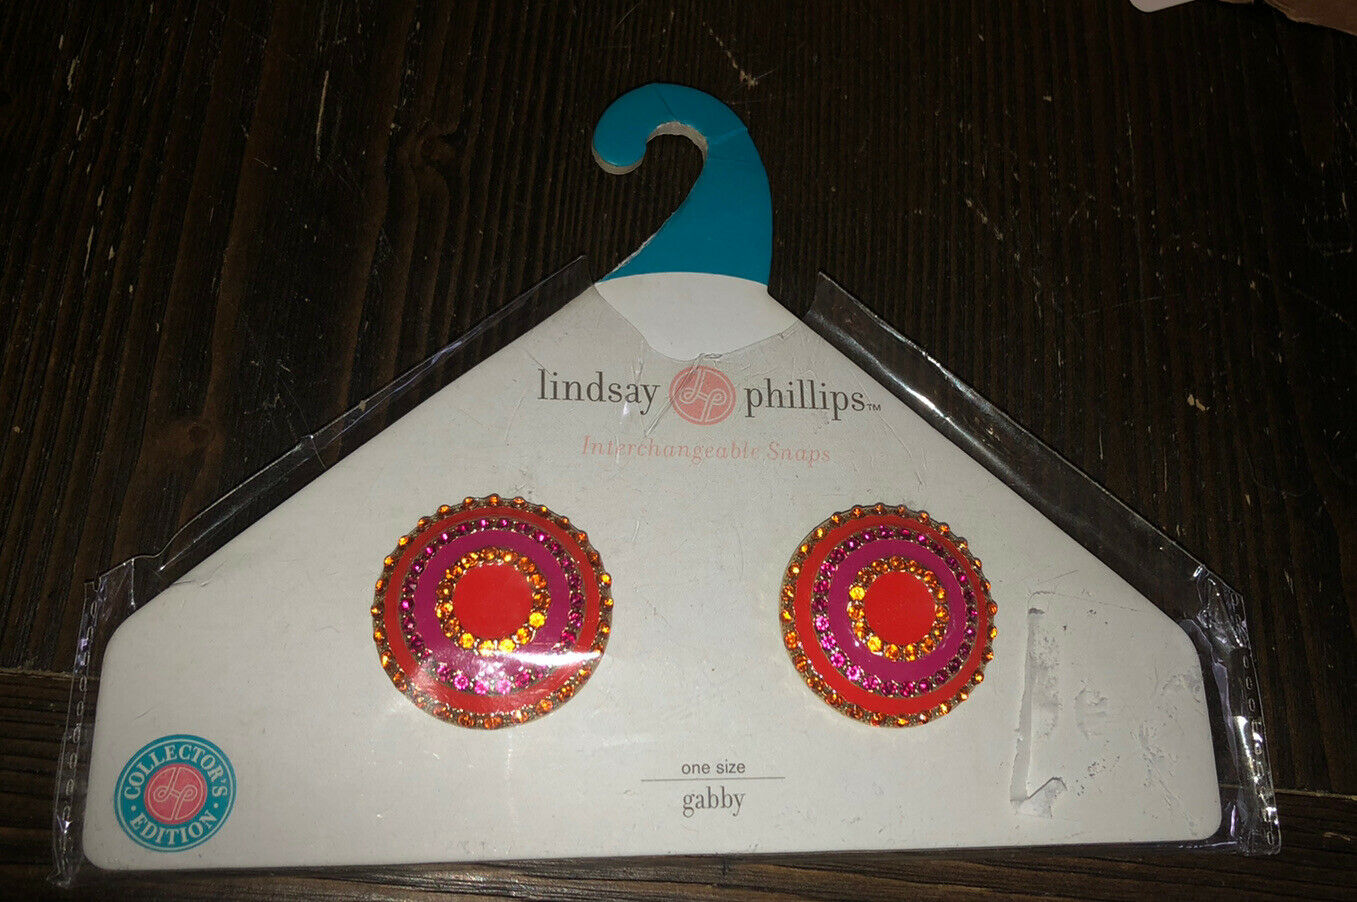 Lindsay Phillips GABBY Interchangeable Shoe Snaps Pink Orange Round Rhinestones